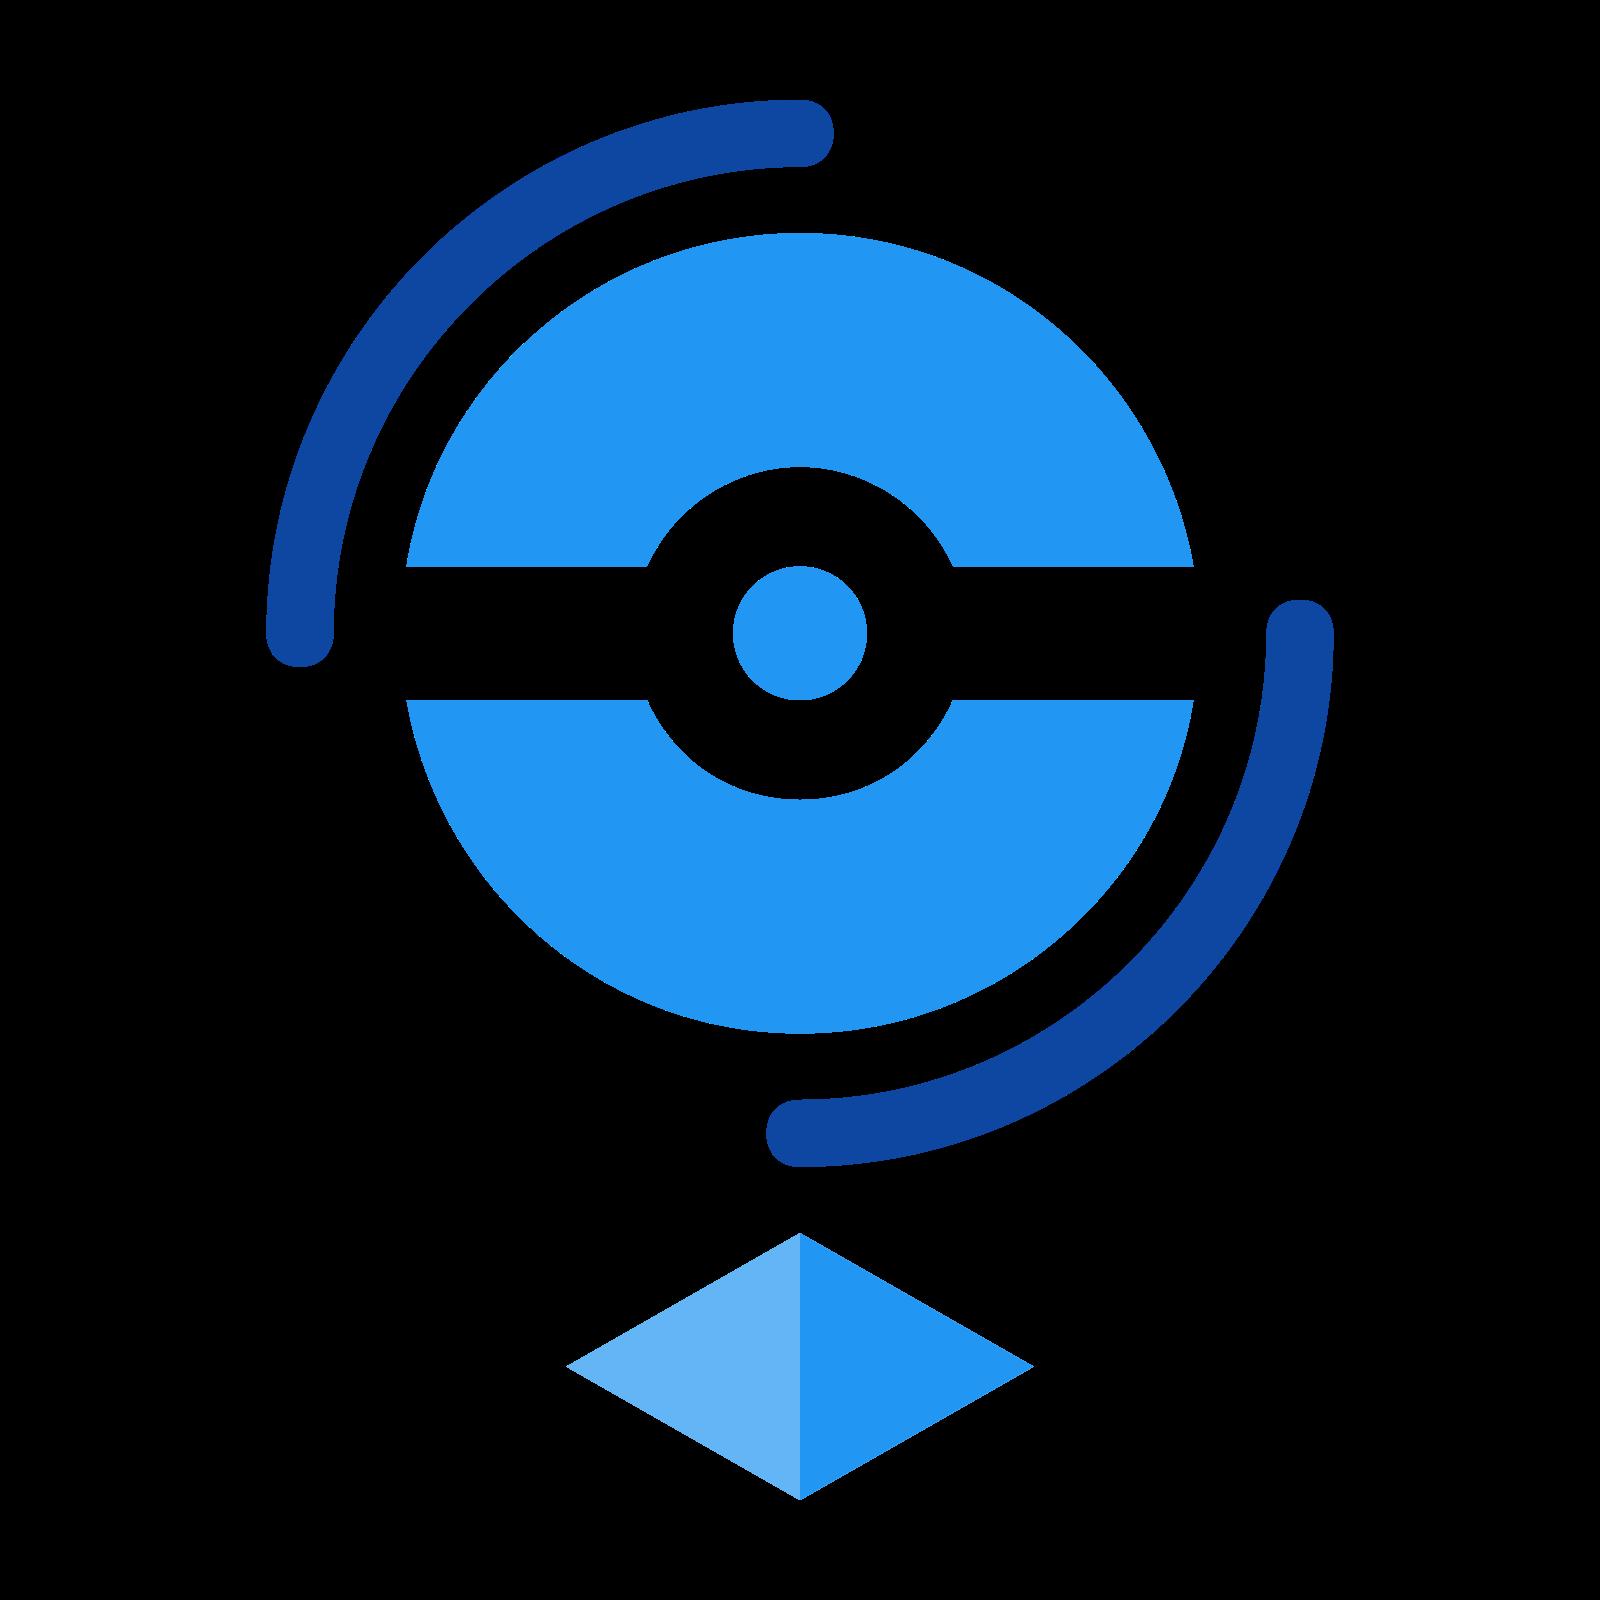 Pokestop Blue icon